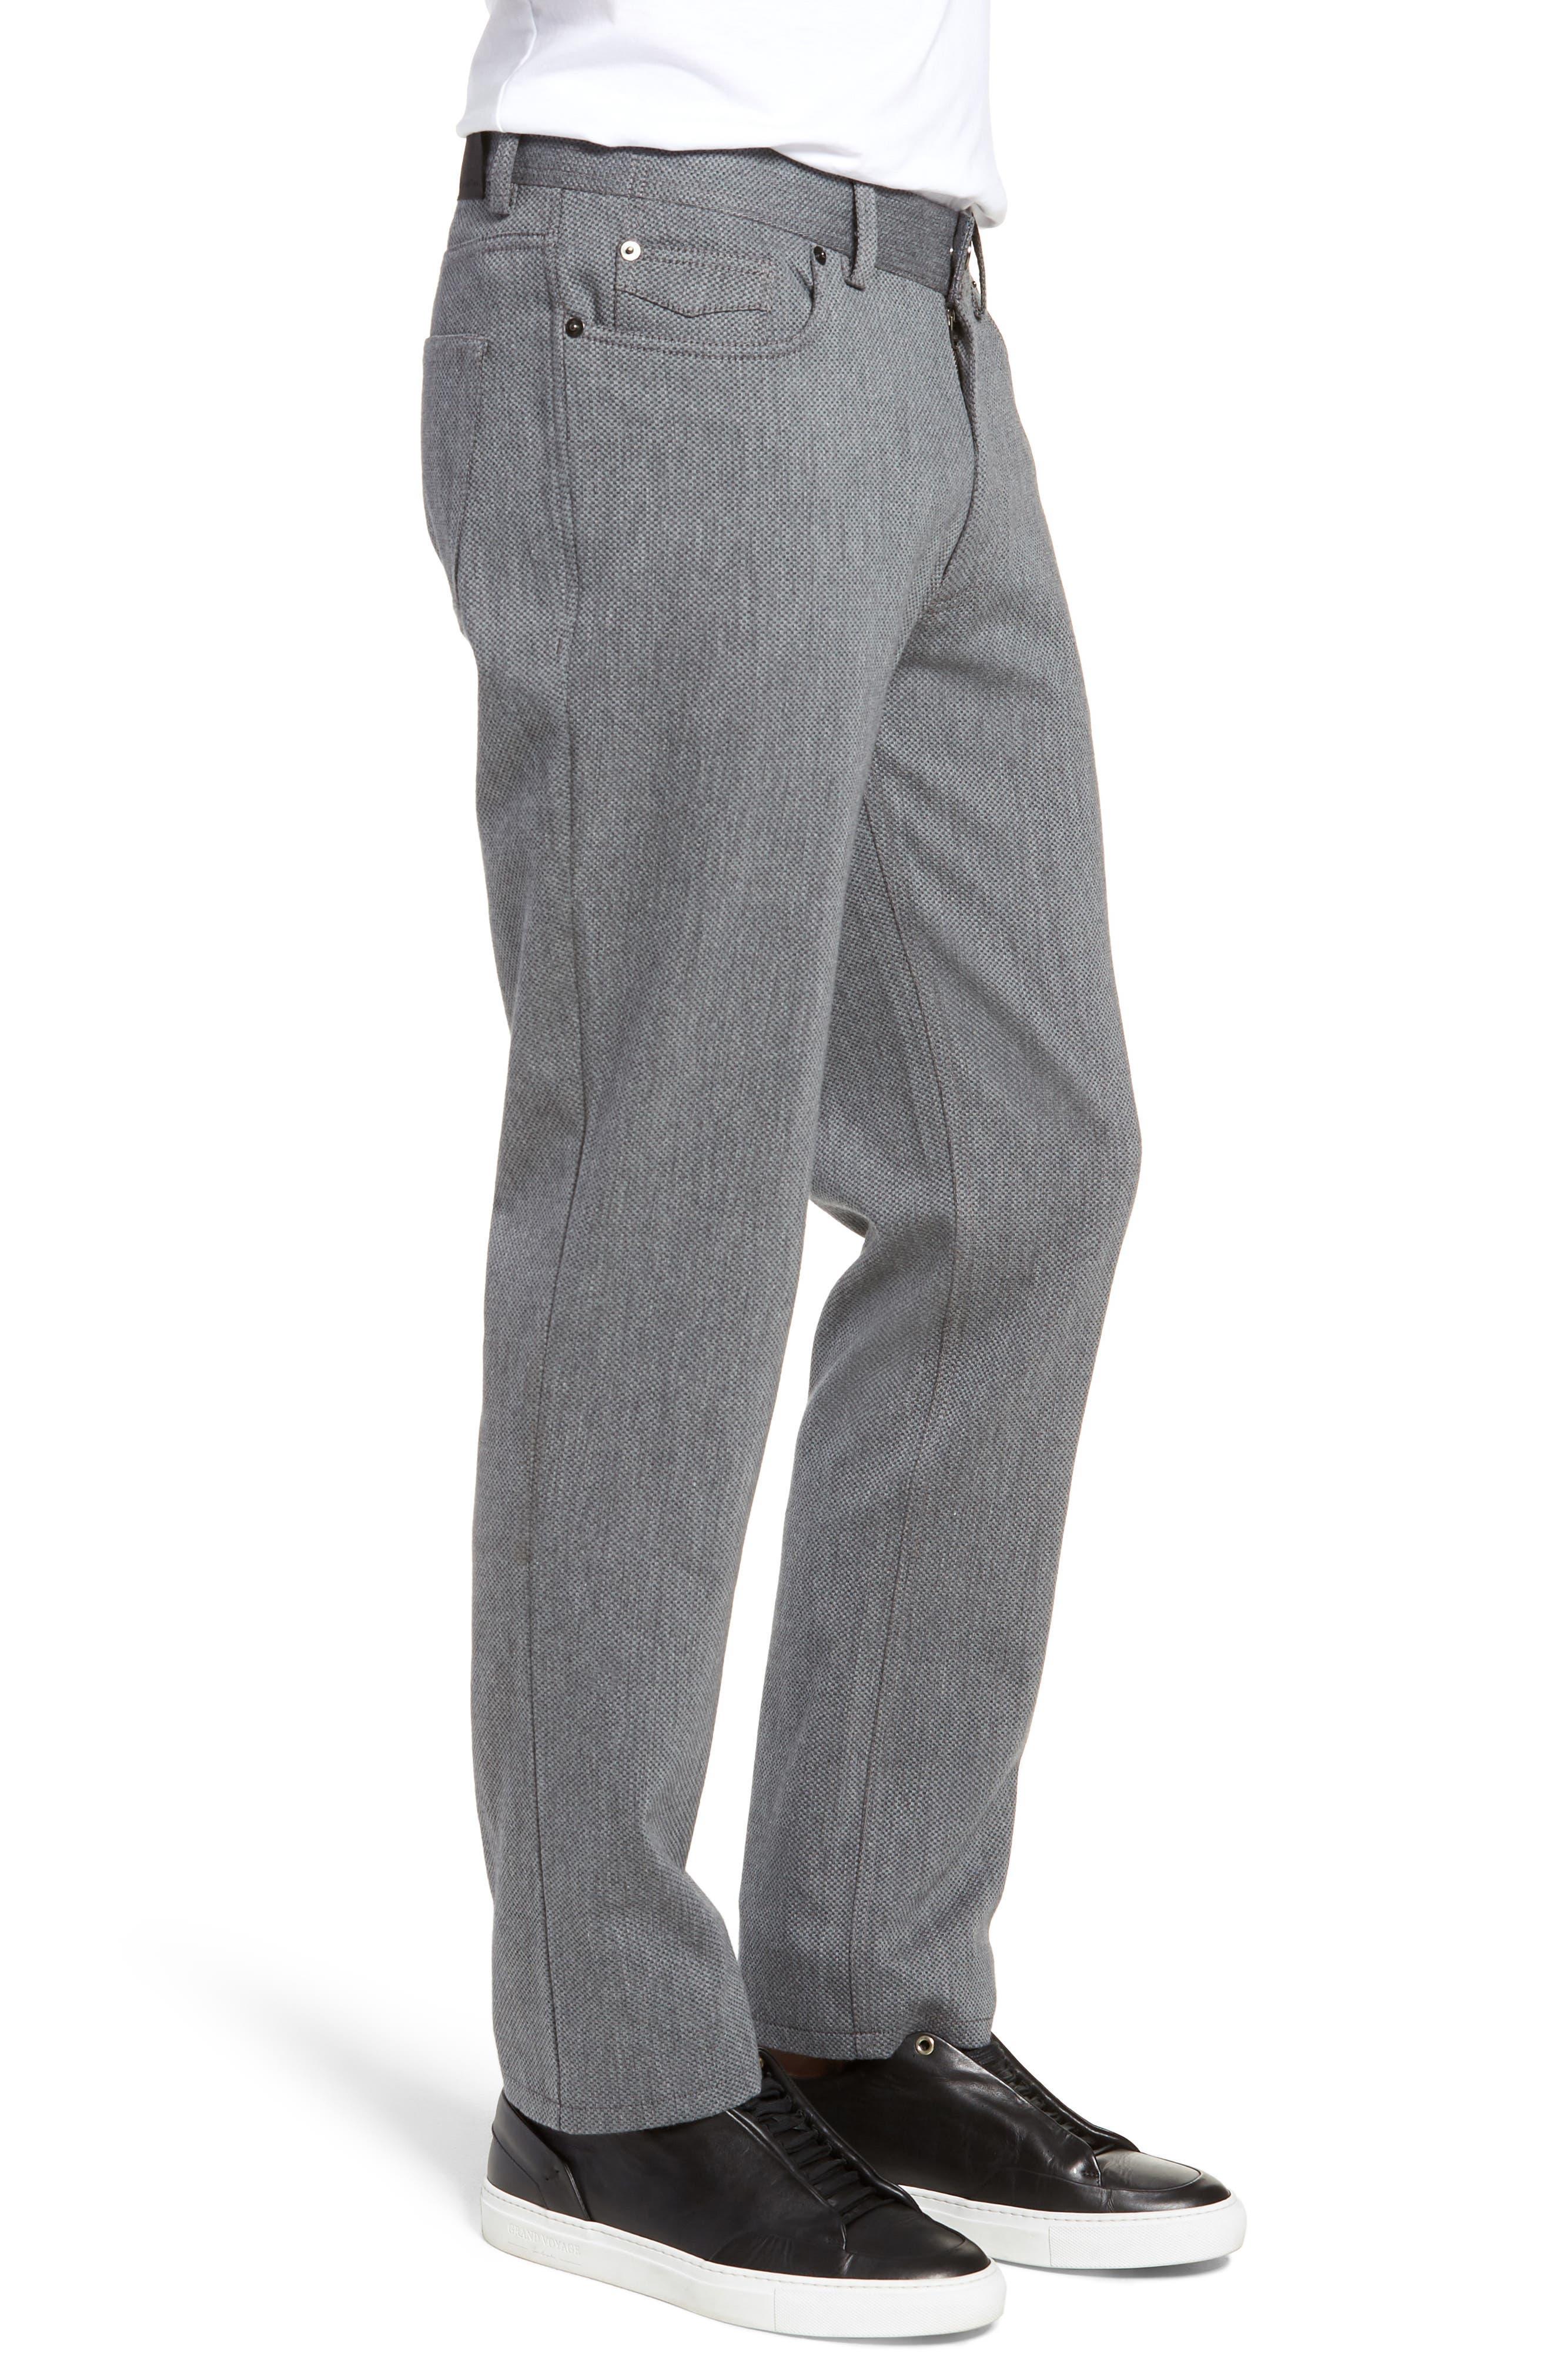 Straight Leg Five Pocket Stretch Pants,                             Alternate thumbnail 3, color,                             HEATHER CHARCOAL CROSSHATCH